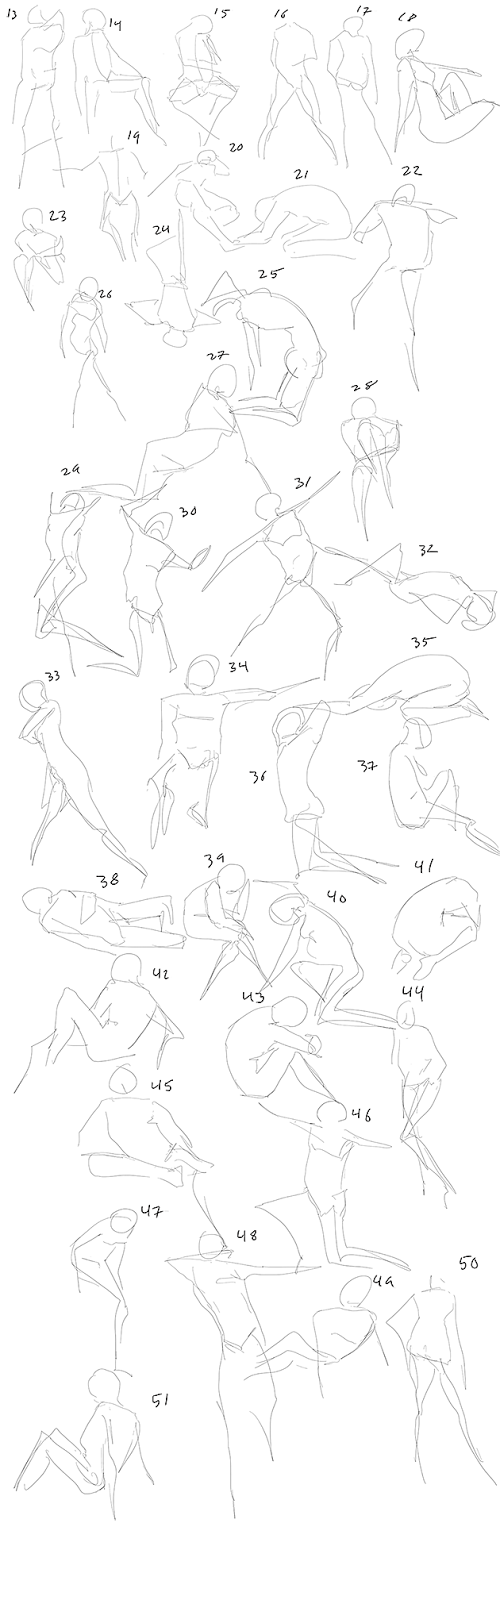 [Image: Gestures_14.png]